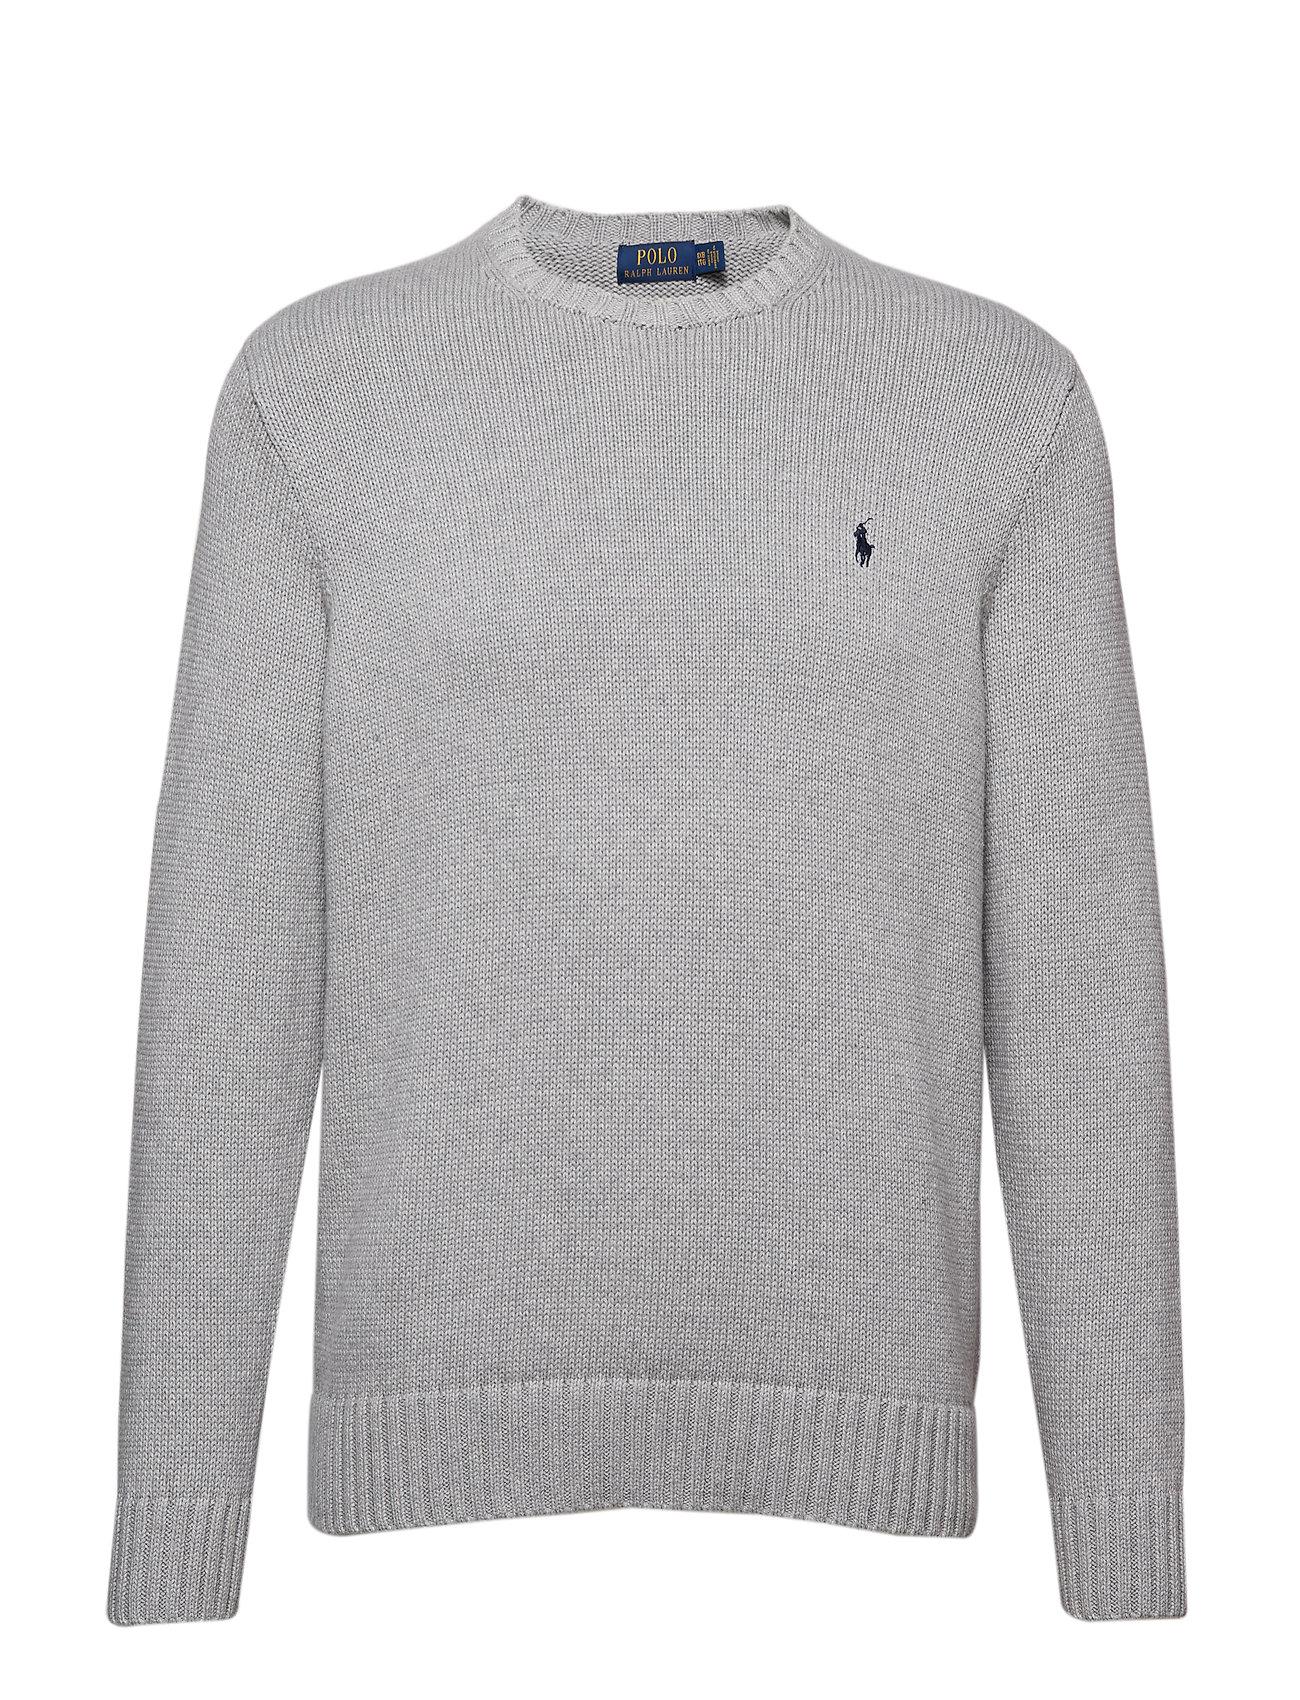 Cotton Grey HeatPolo Sweaterandover Ralph Tall Bigamp; Lauren Crewneck CerdBox